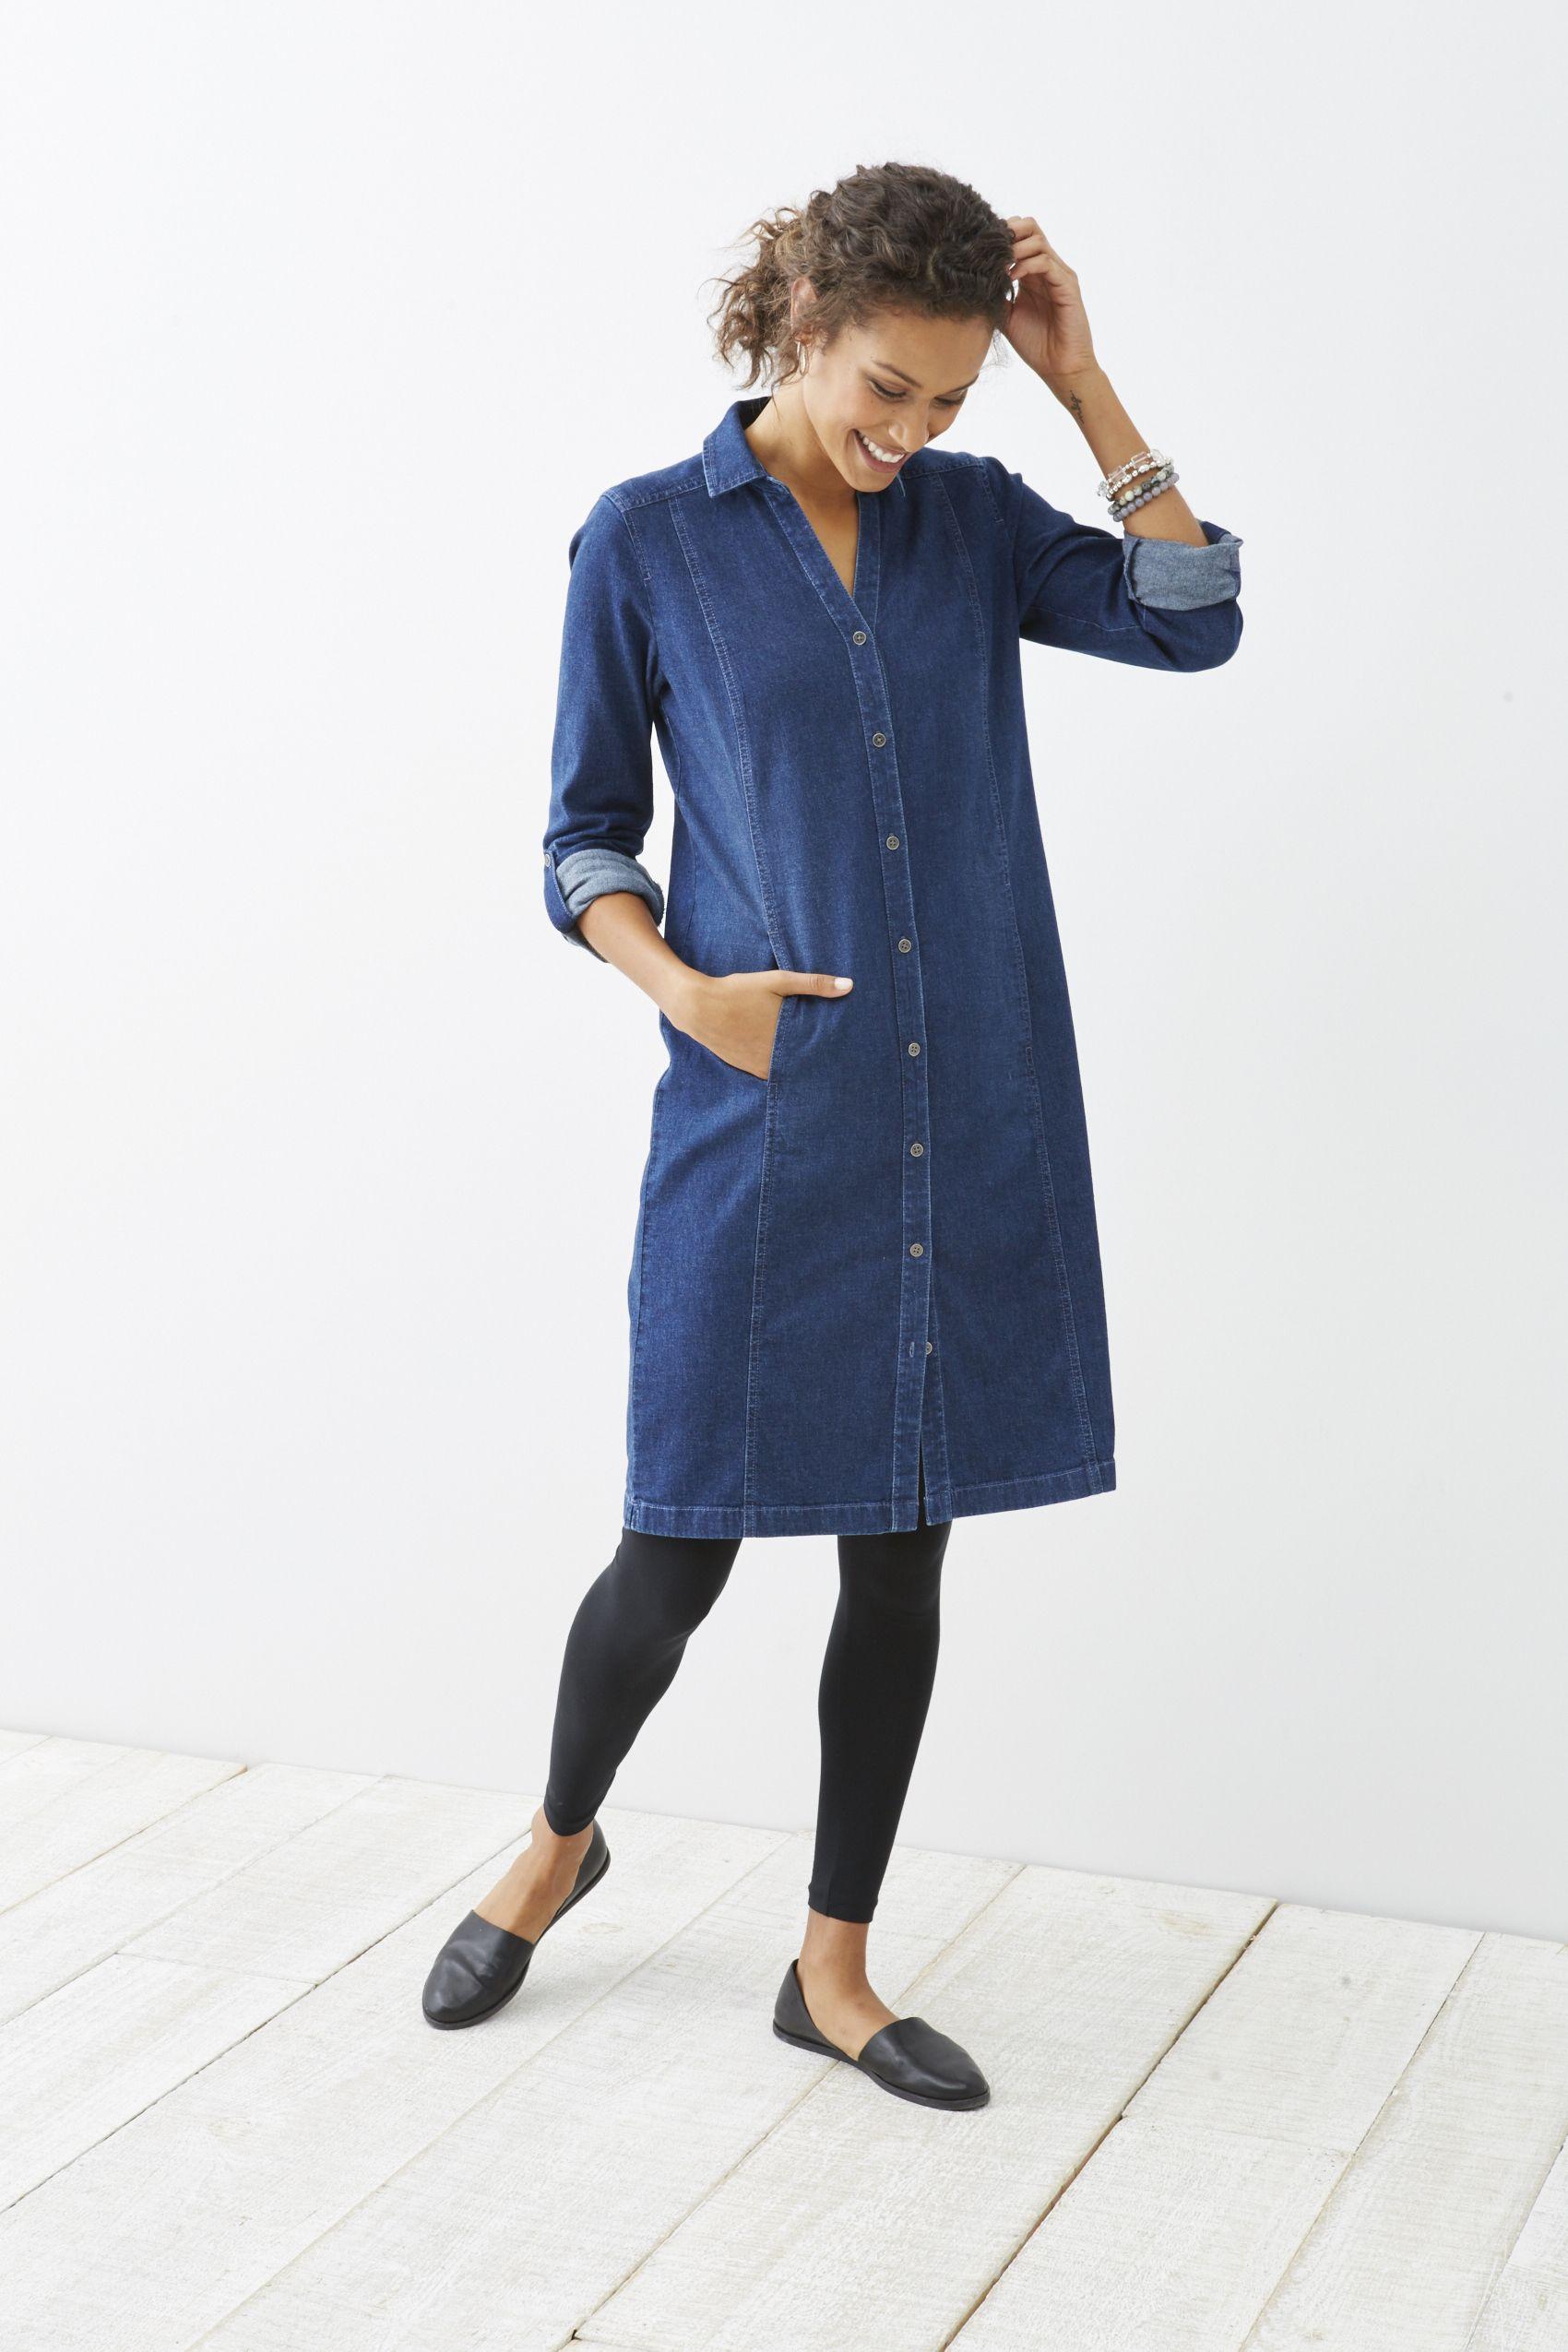 stretch-denim shirtdress | Outfits with leggings, Denim shirt ...